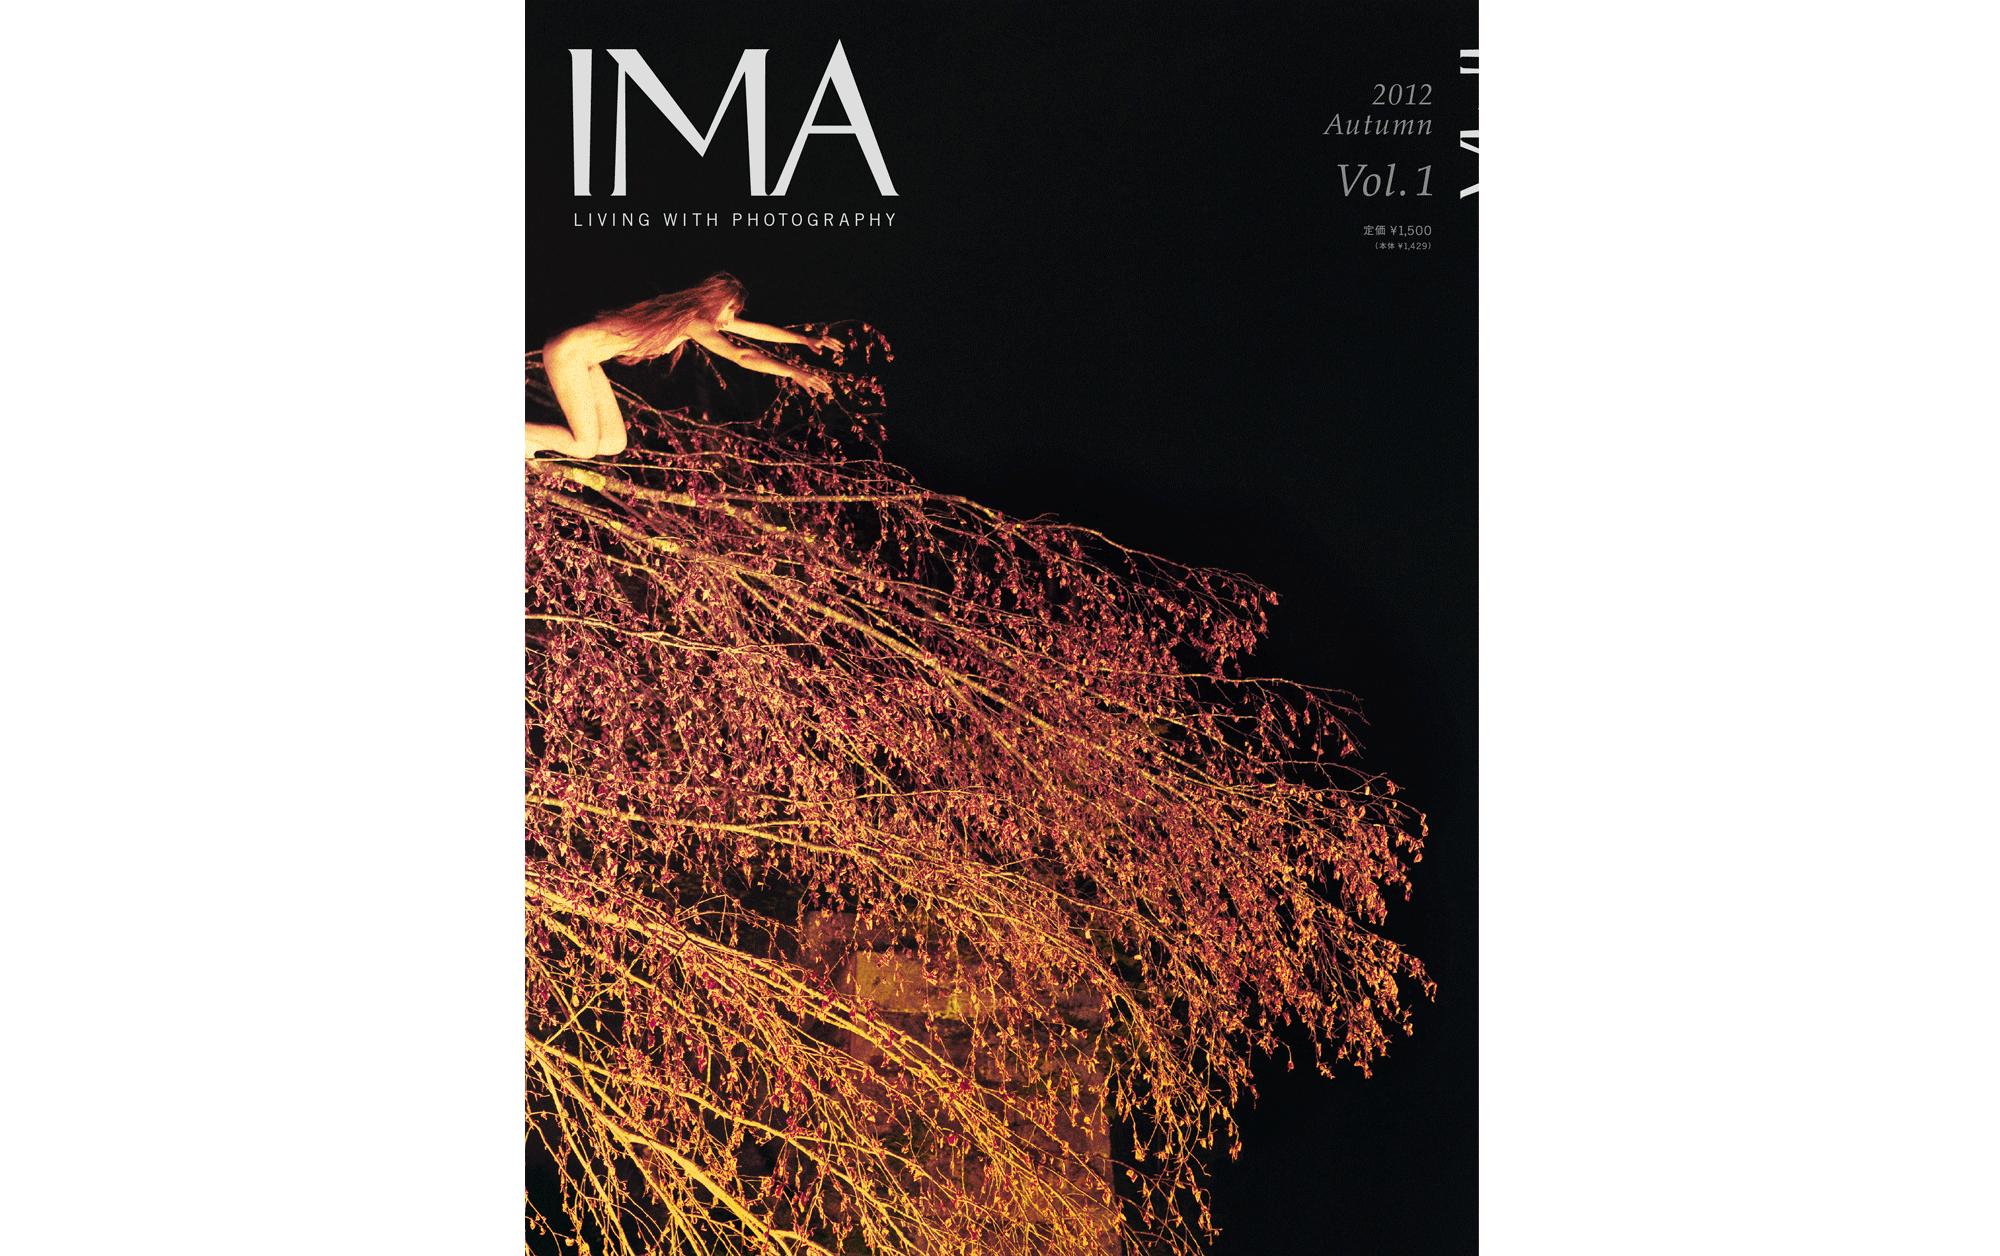 IMA 2012 Autumn Vol.1